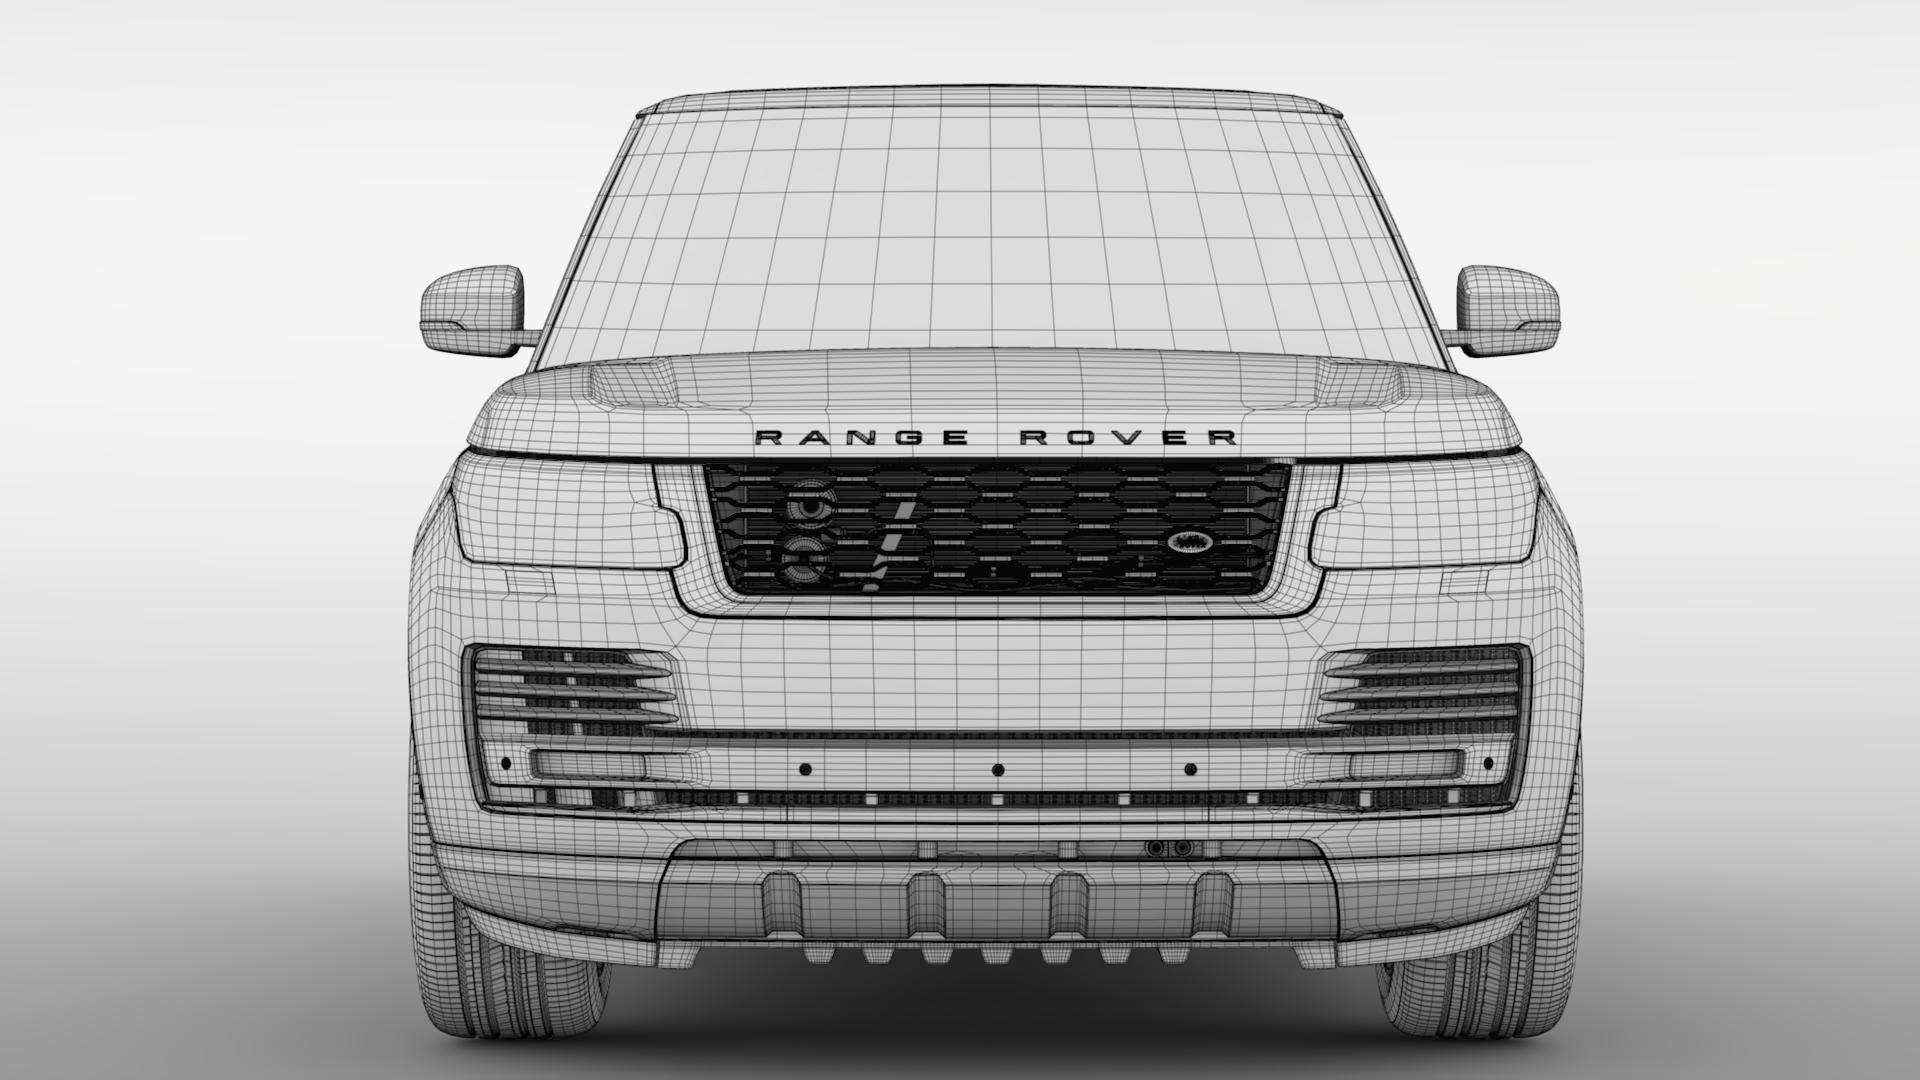 range rover hybrid lwb l405 2018 3d model max fbx c4d lwo ma mb hrc xsi obj 277431